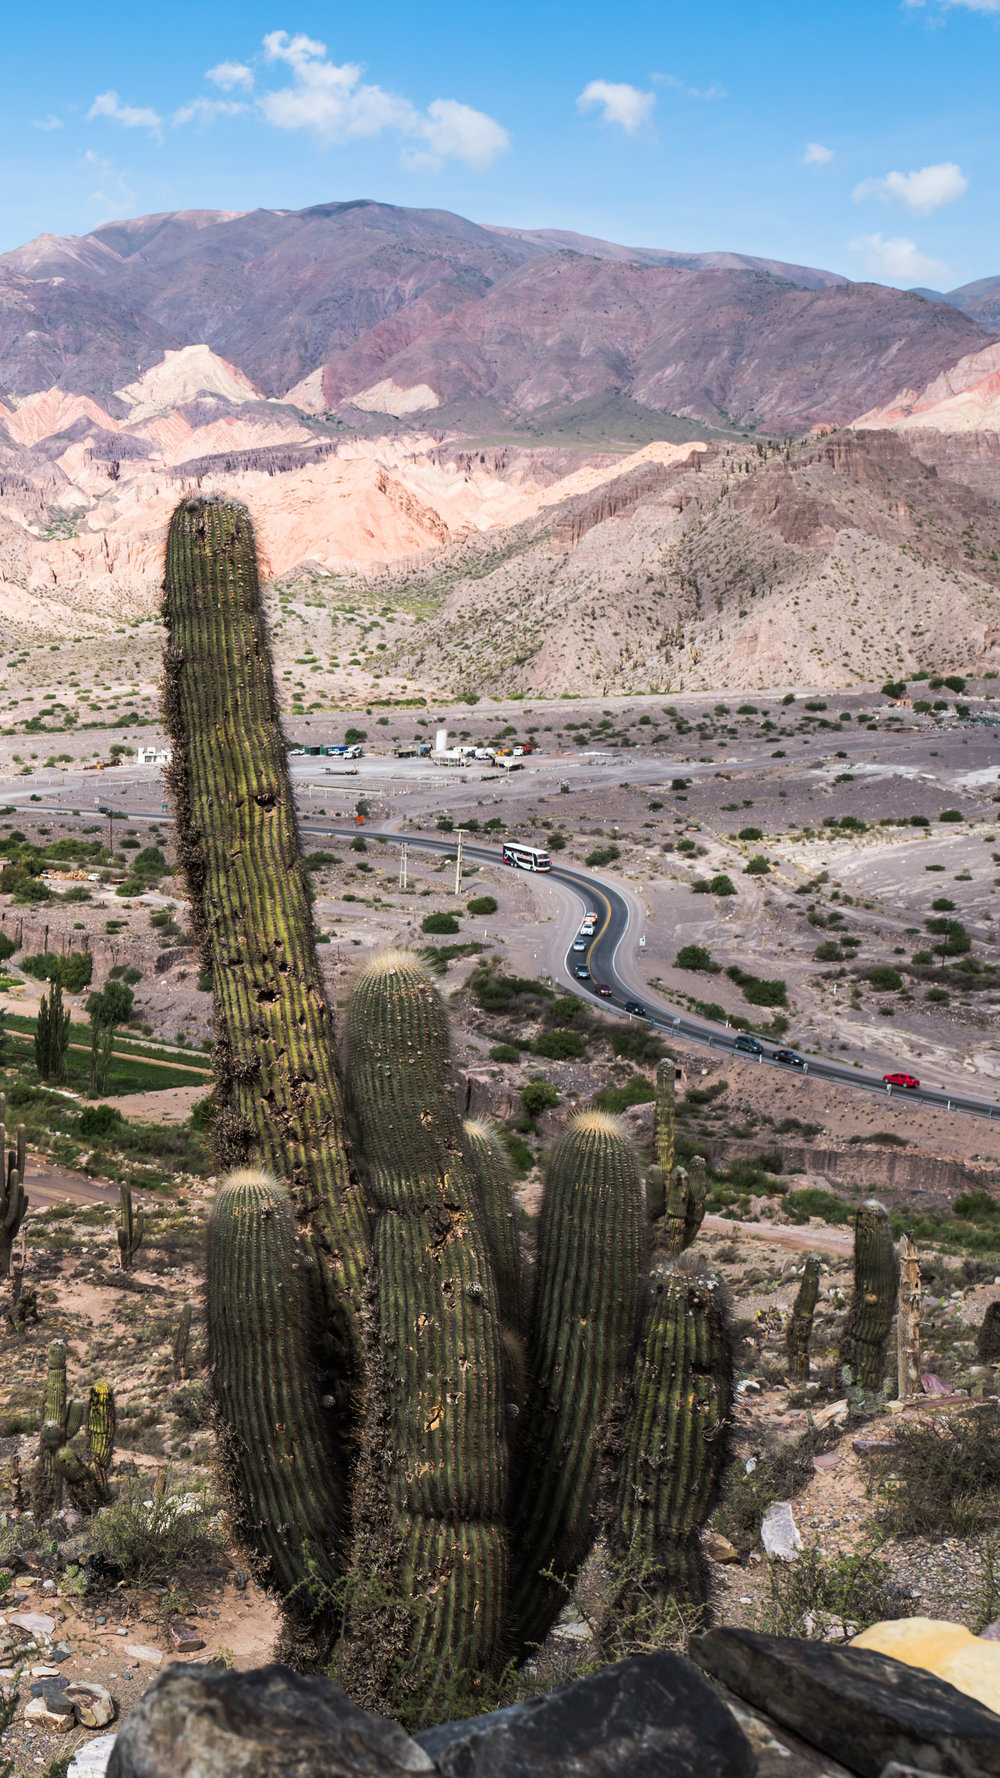 All hail to The Huge Cactus! at: Pucara de Tilcara